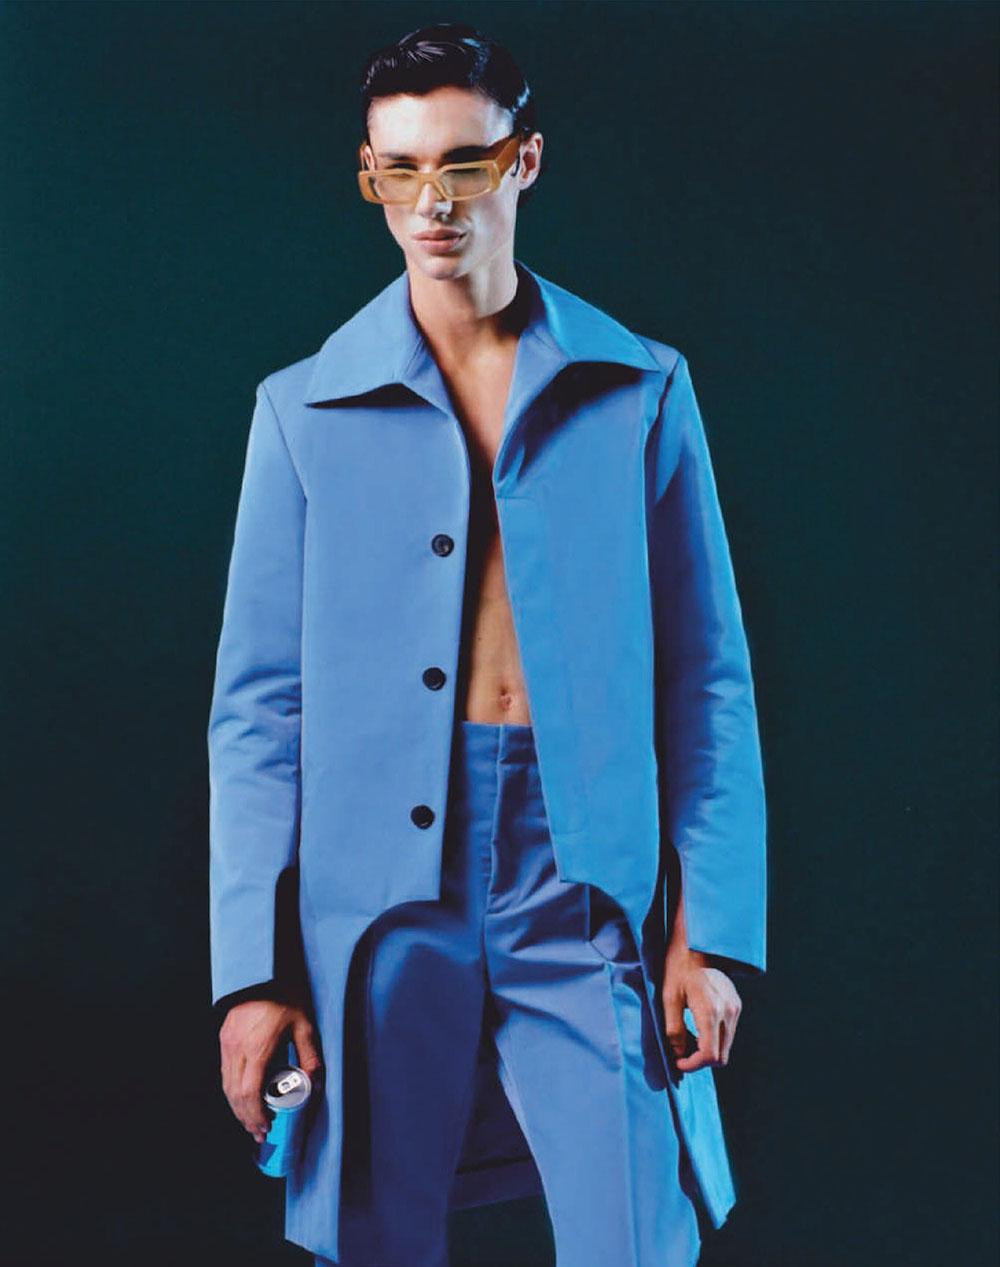 Fernando Lindez by Fernando Uceda for Esquire Spain October 2020